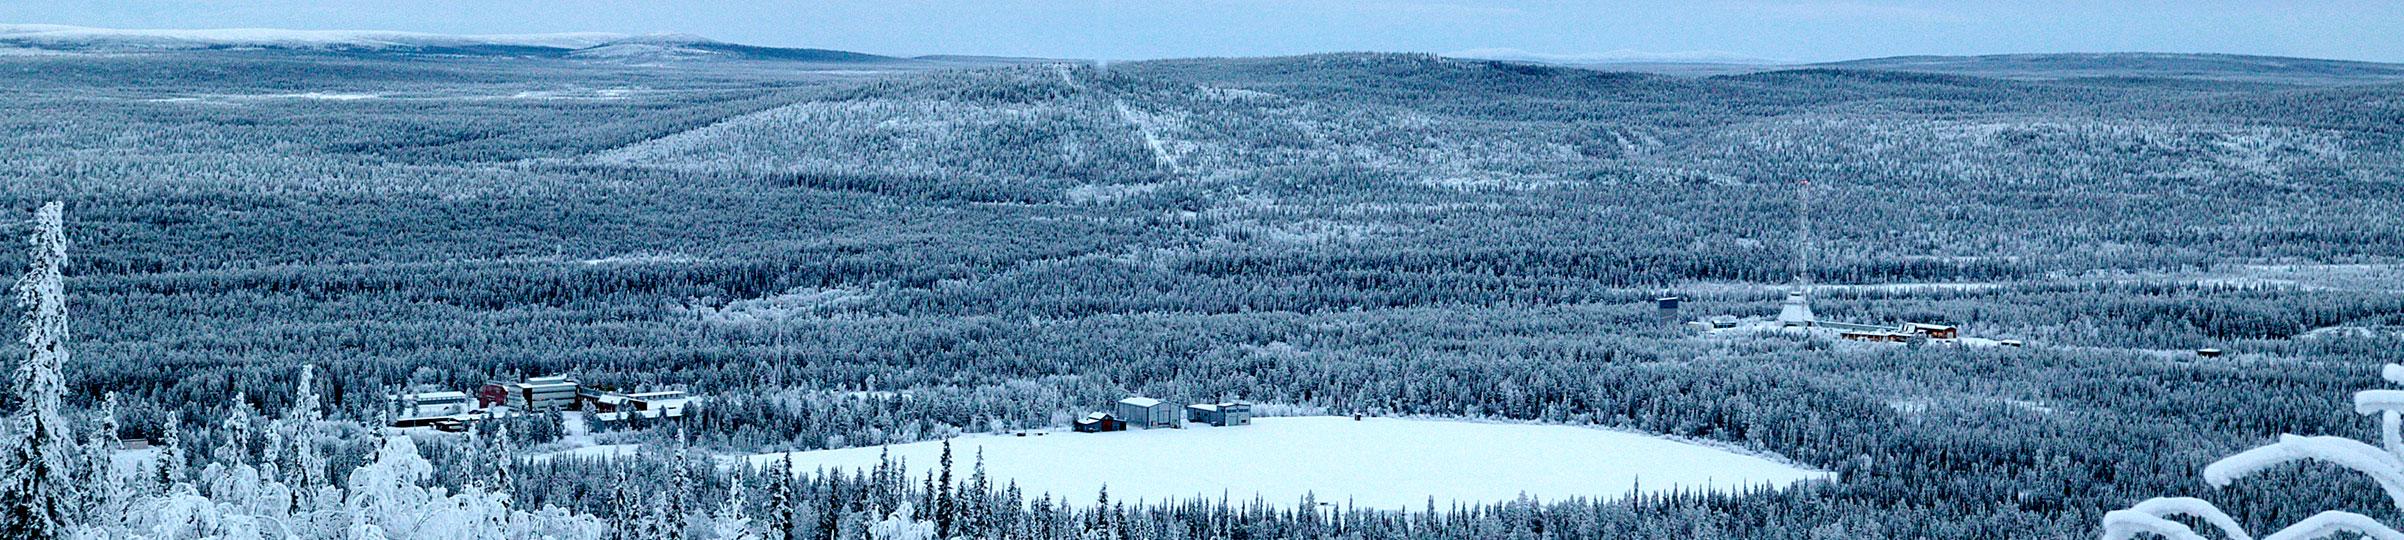 Esrange in winter